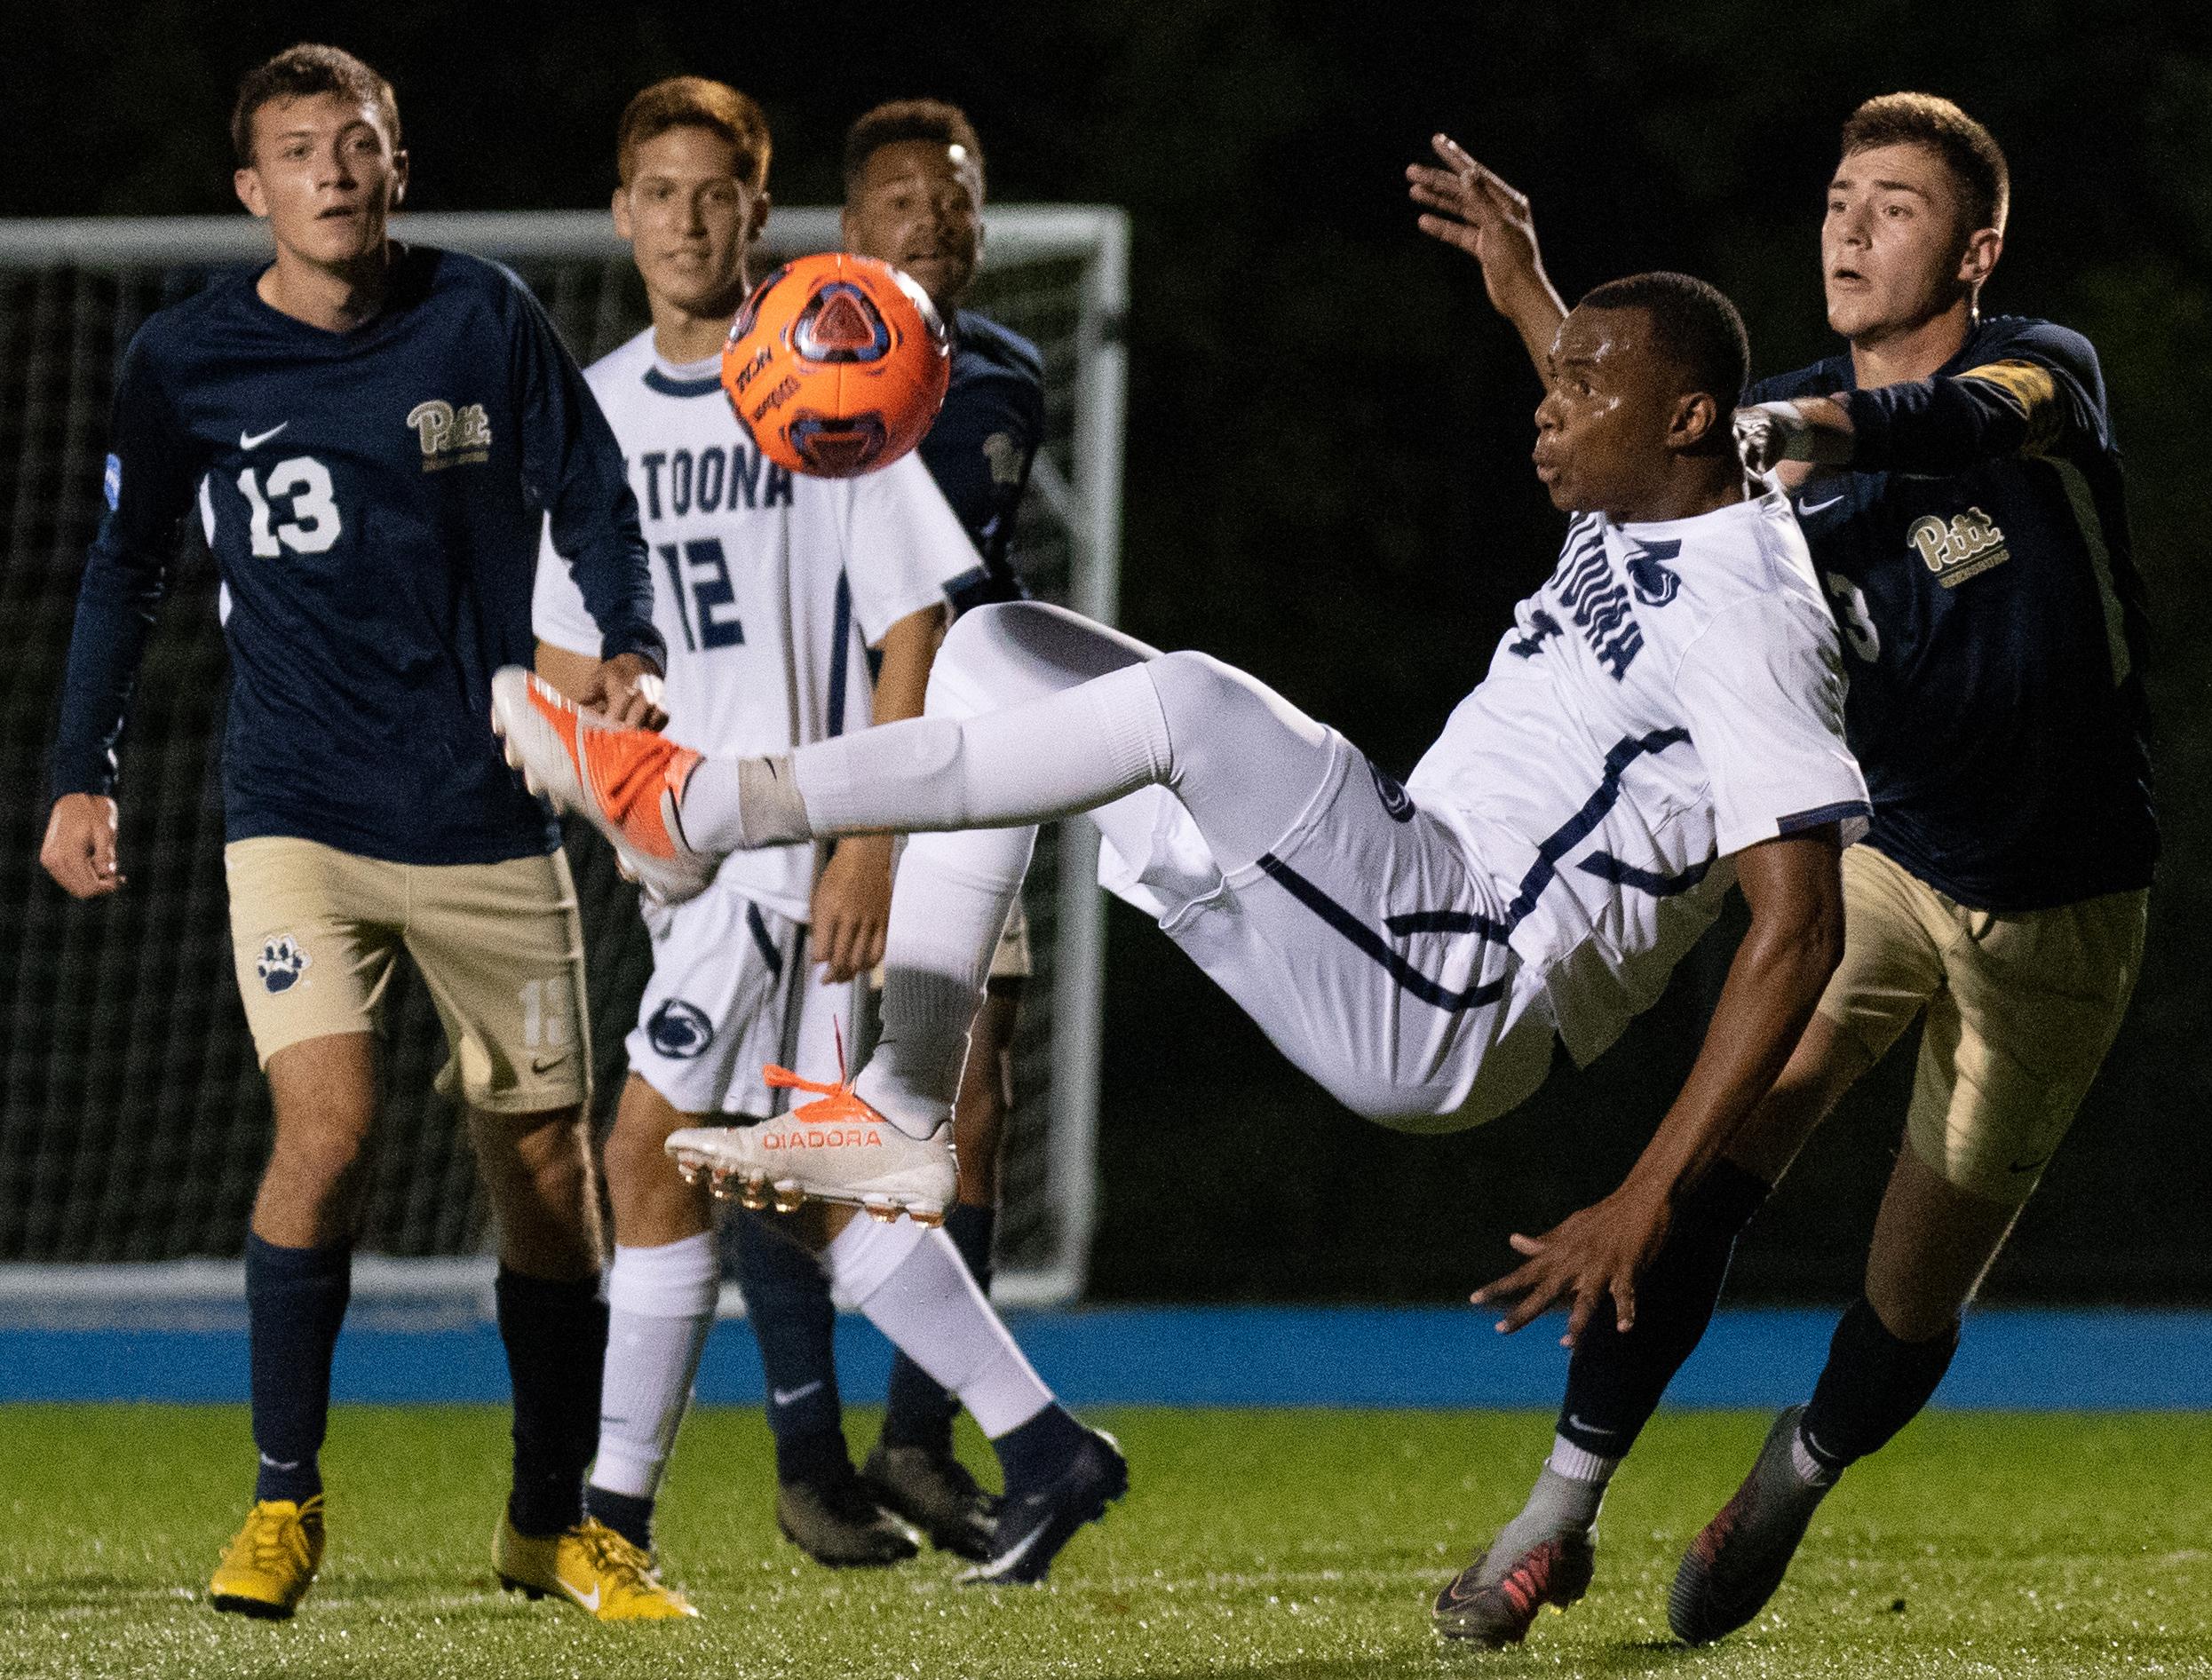 Men's Soccer, Pitt Greensburg, Alhaji Umaru Koroma